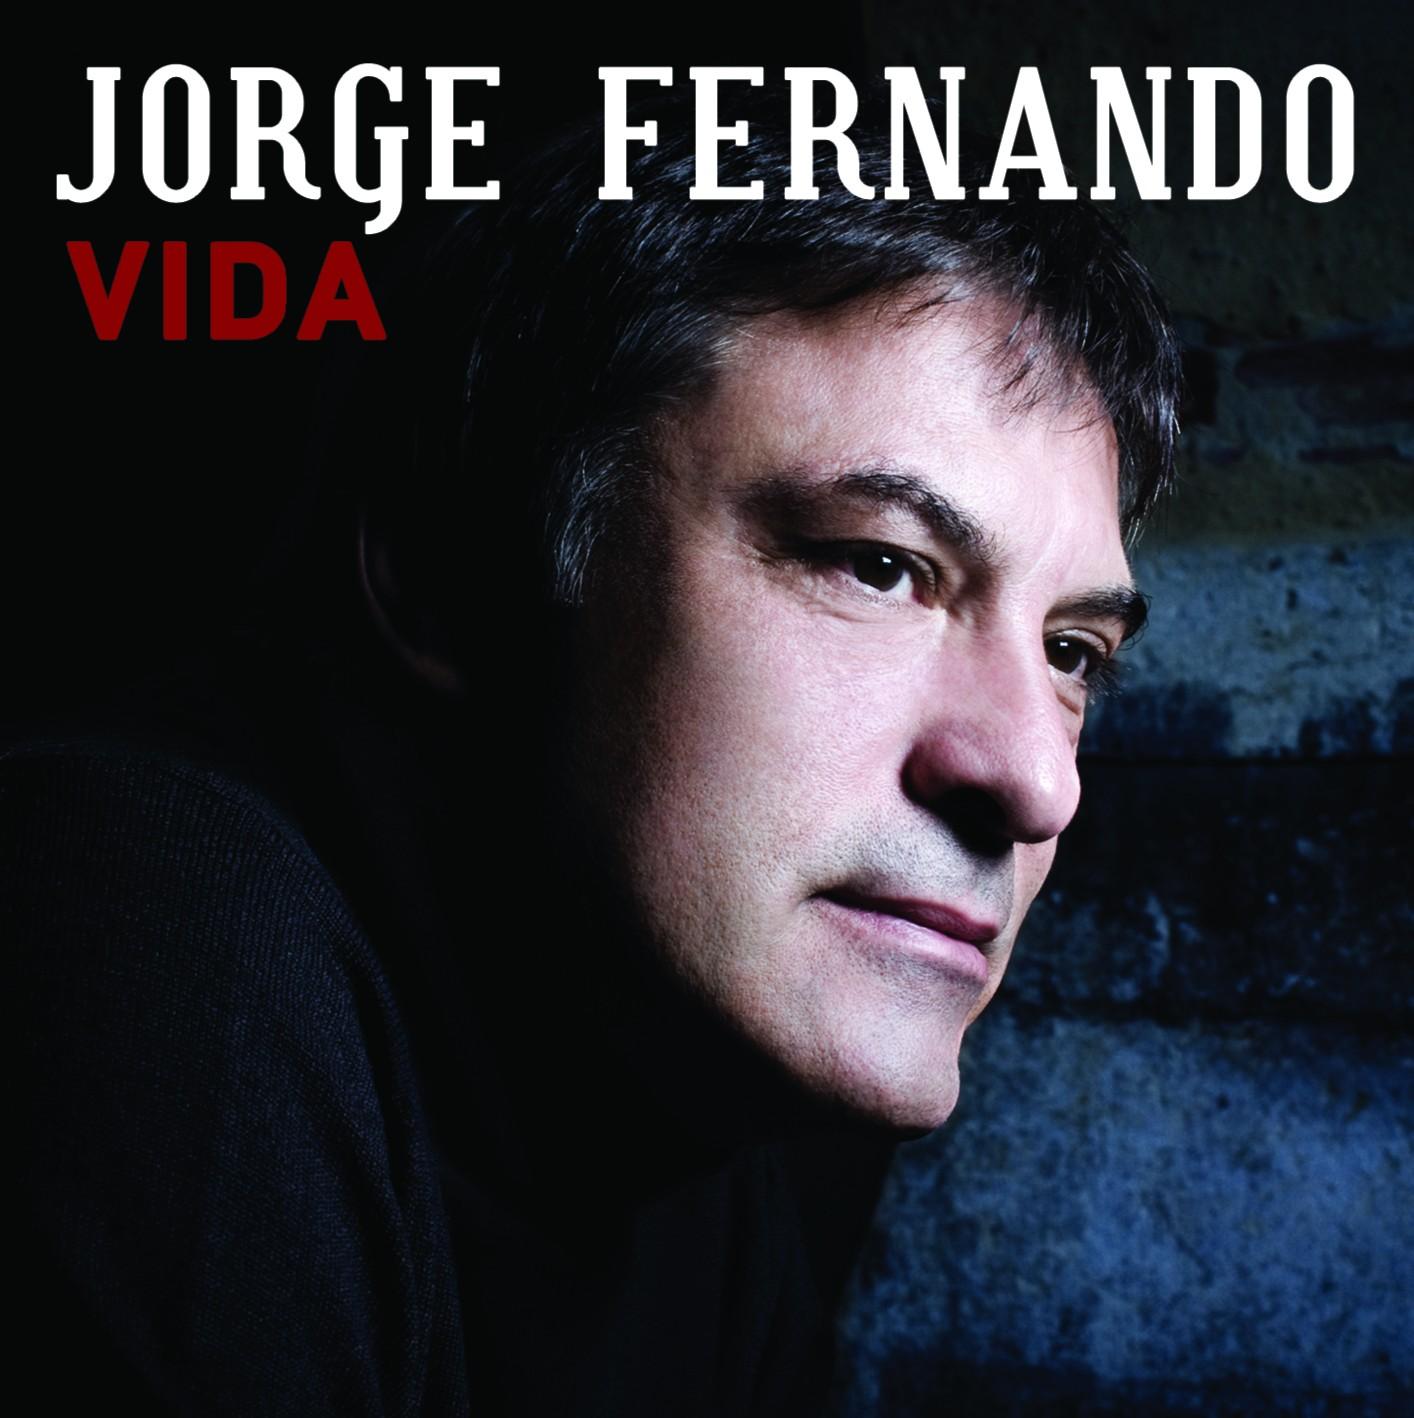 Fernando Jorge Logo Wallpaper